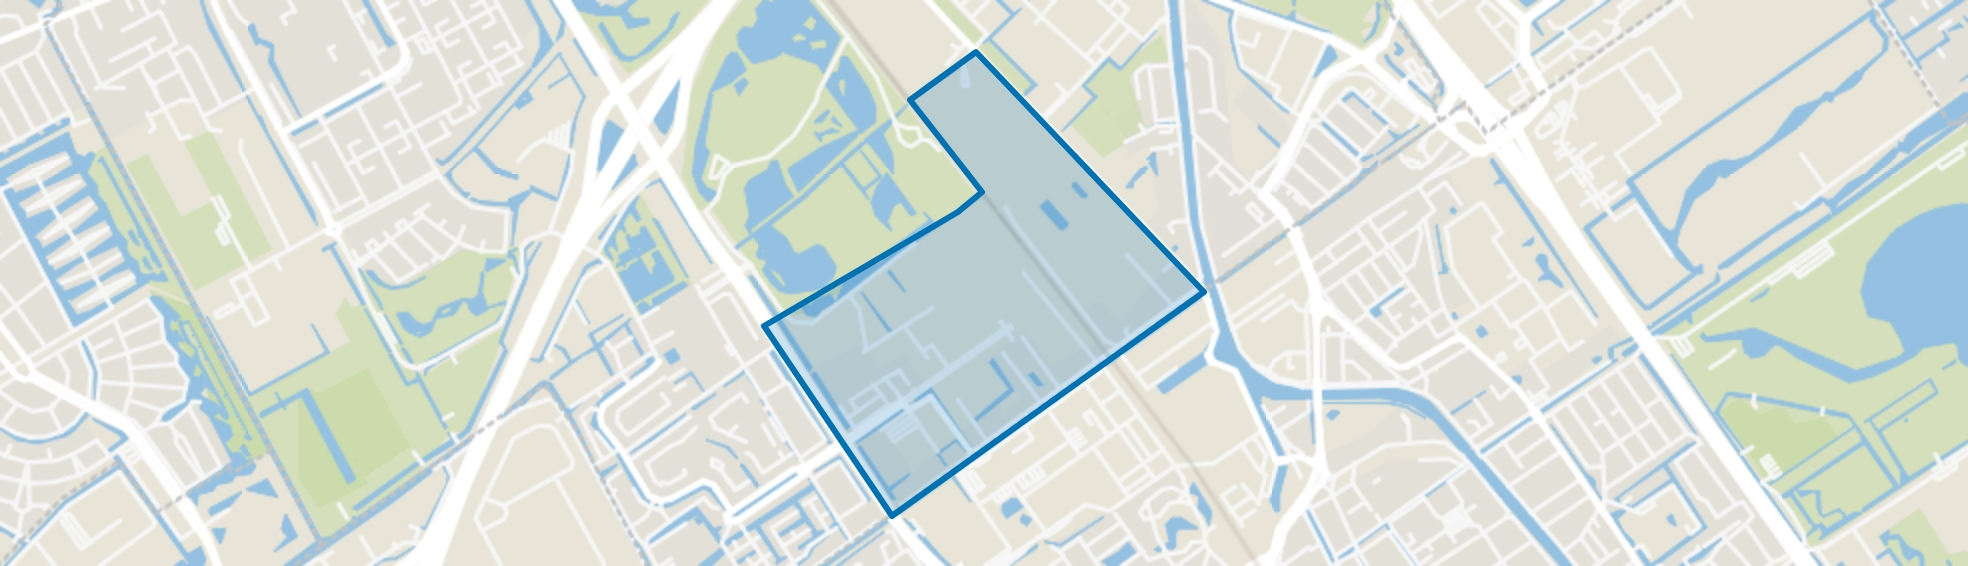 Haantje, Rijswijk (ZH) map